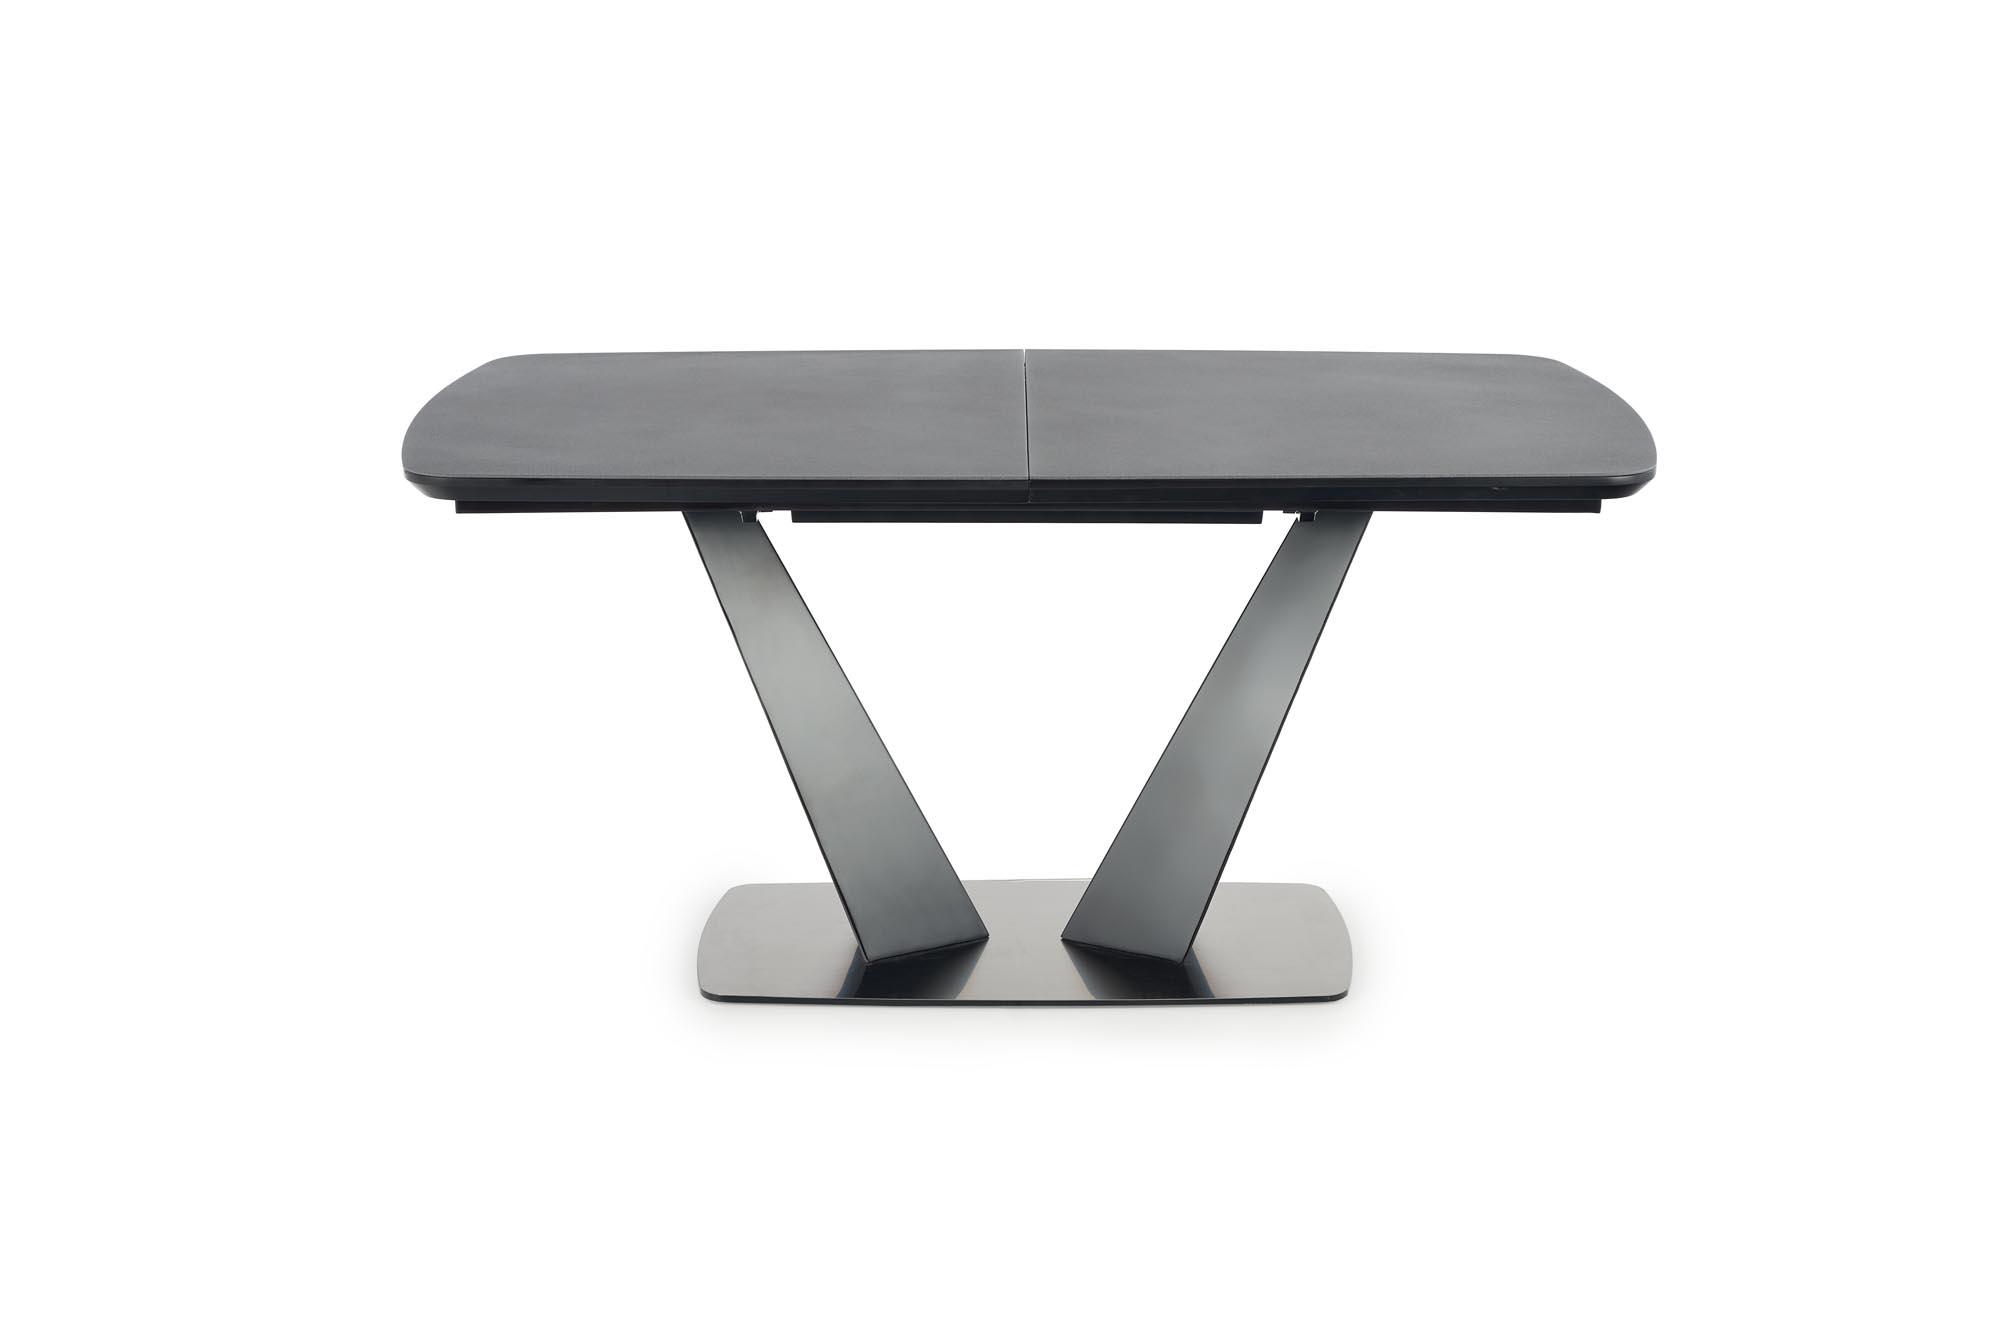 FANGOR rozkladací stôl, doska - tmavo šedá, podstavec - čierny